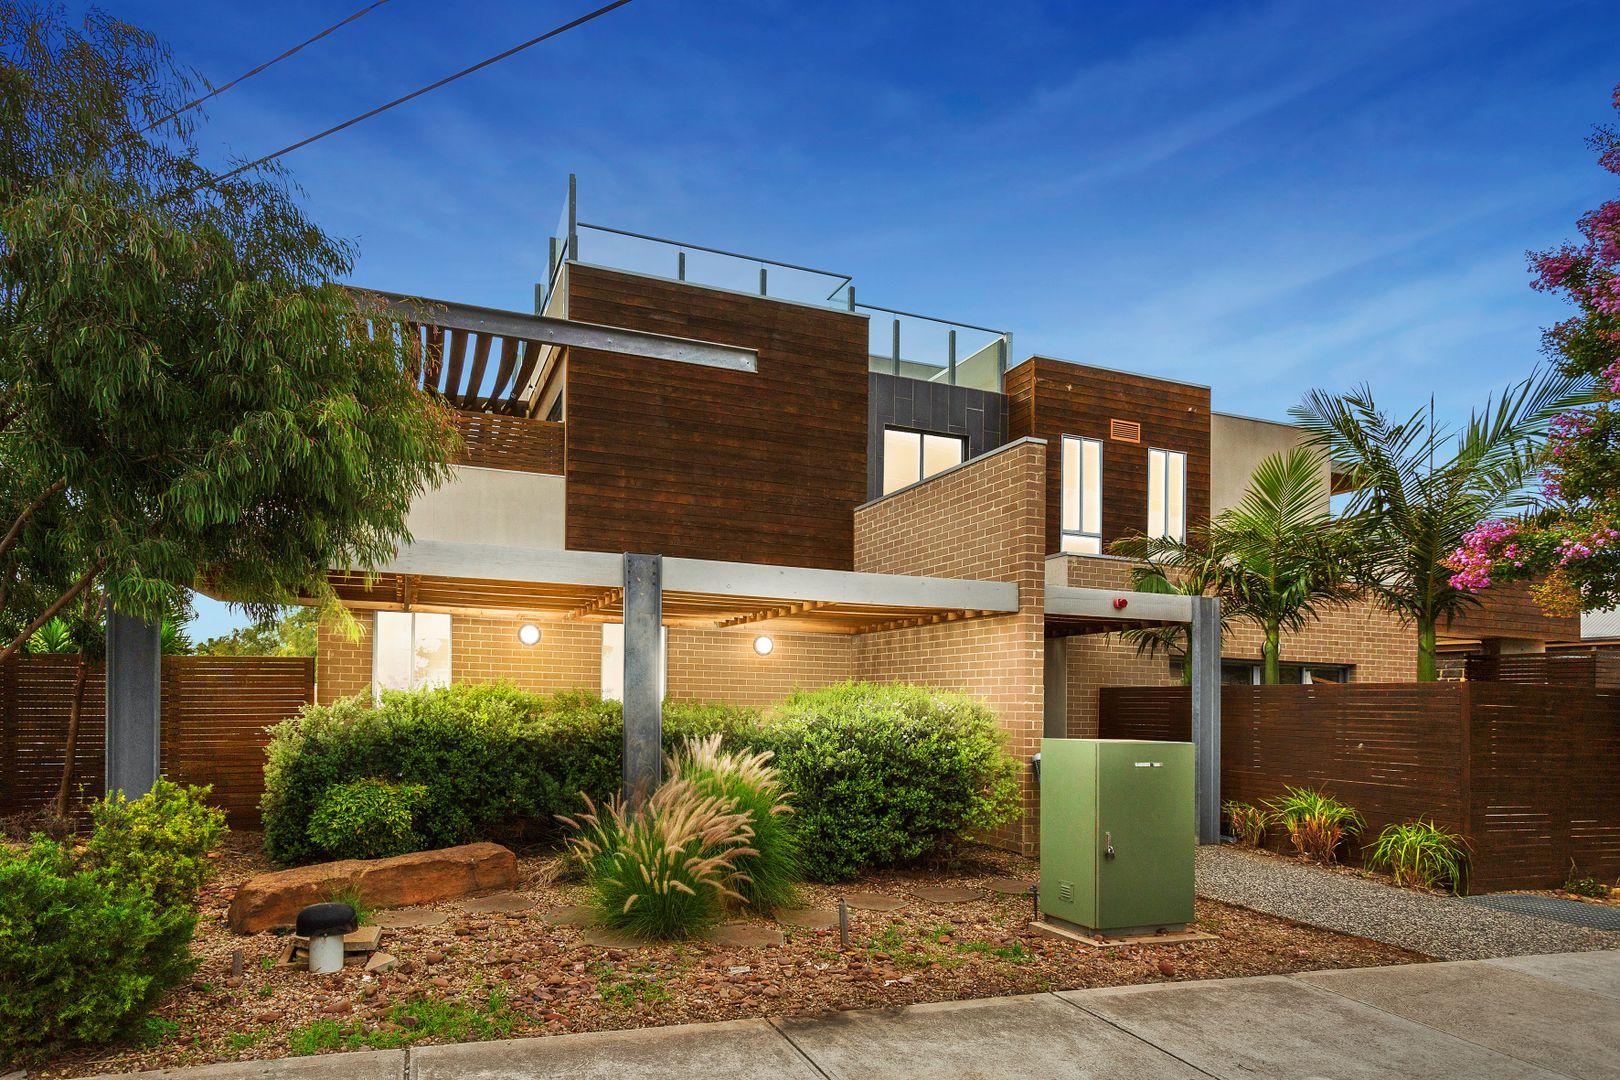 19/155 Gordon  Street, Footscray VIC 3011, Image 0